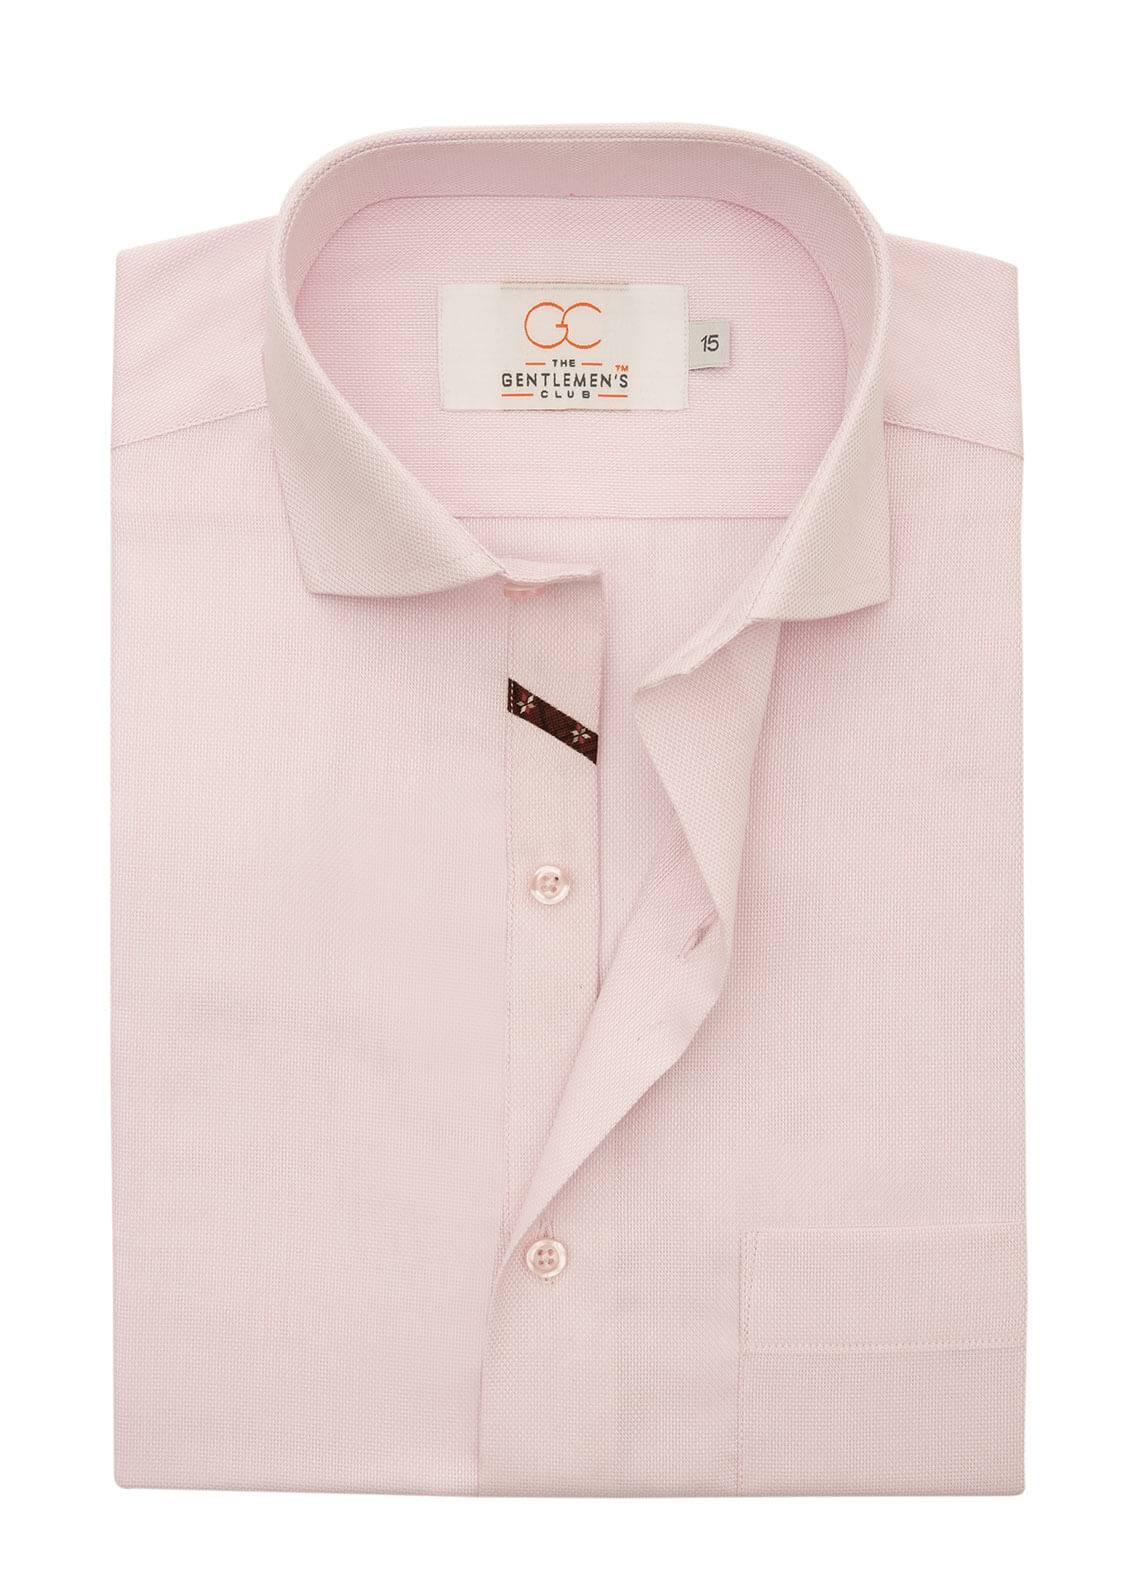 The Gentlemen's Club Cotton Formal Men Shirts - Pink White Label 4069 - 14.5